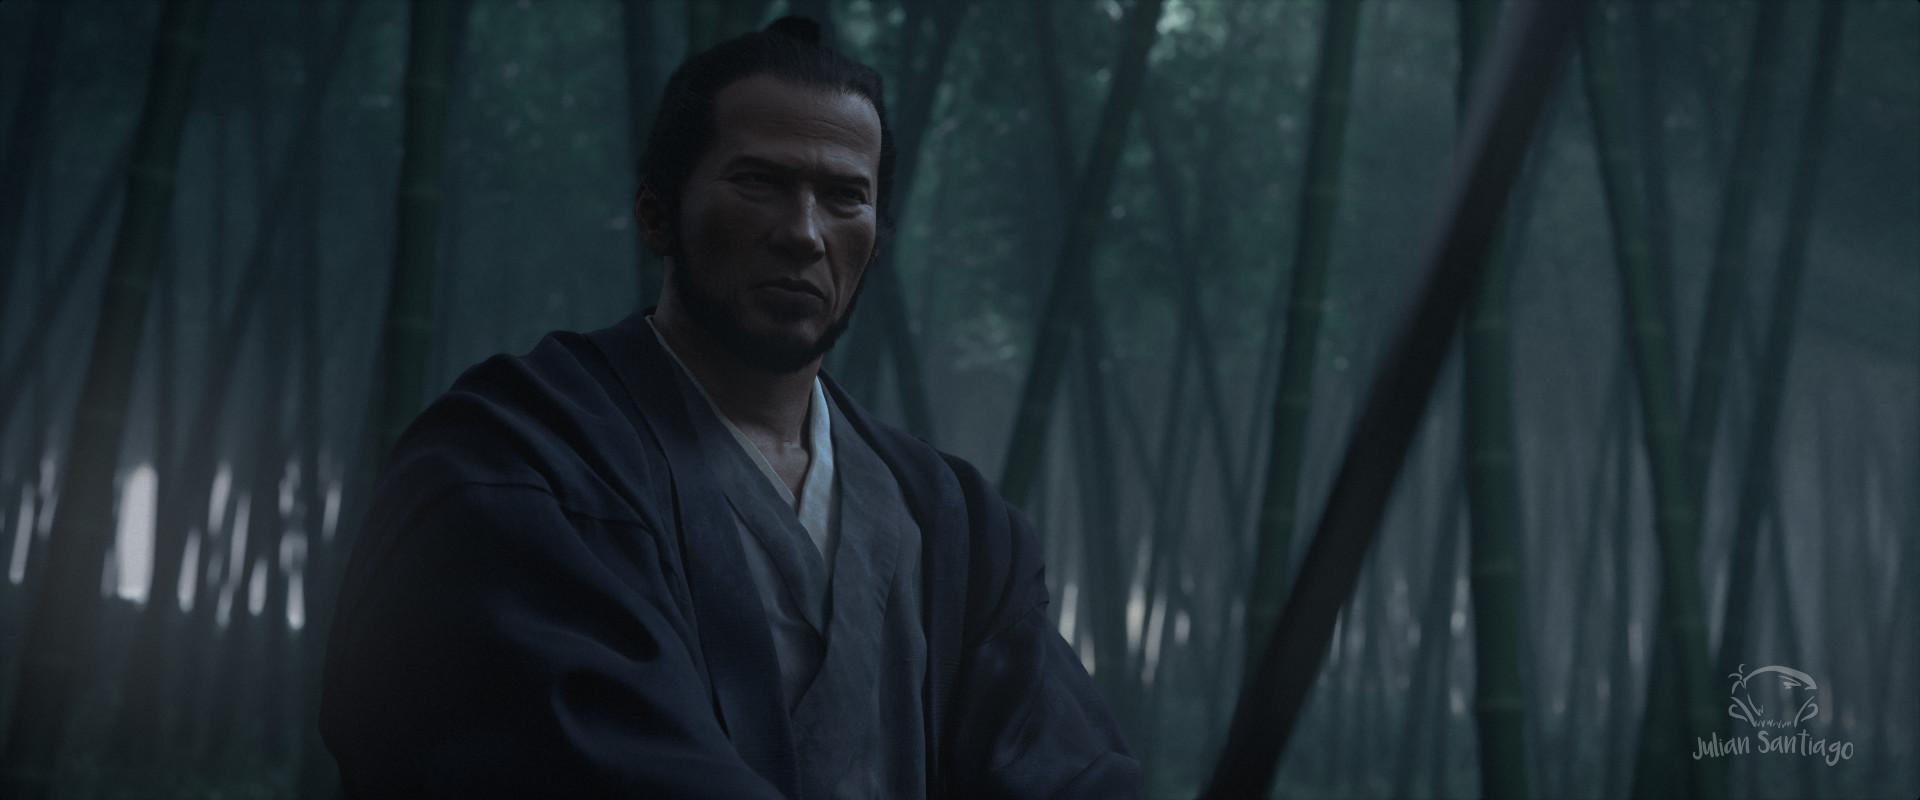 Julian santiago juliansantiago samurai darkstill